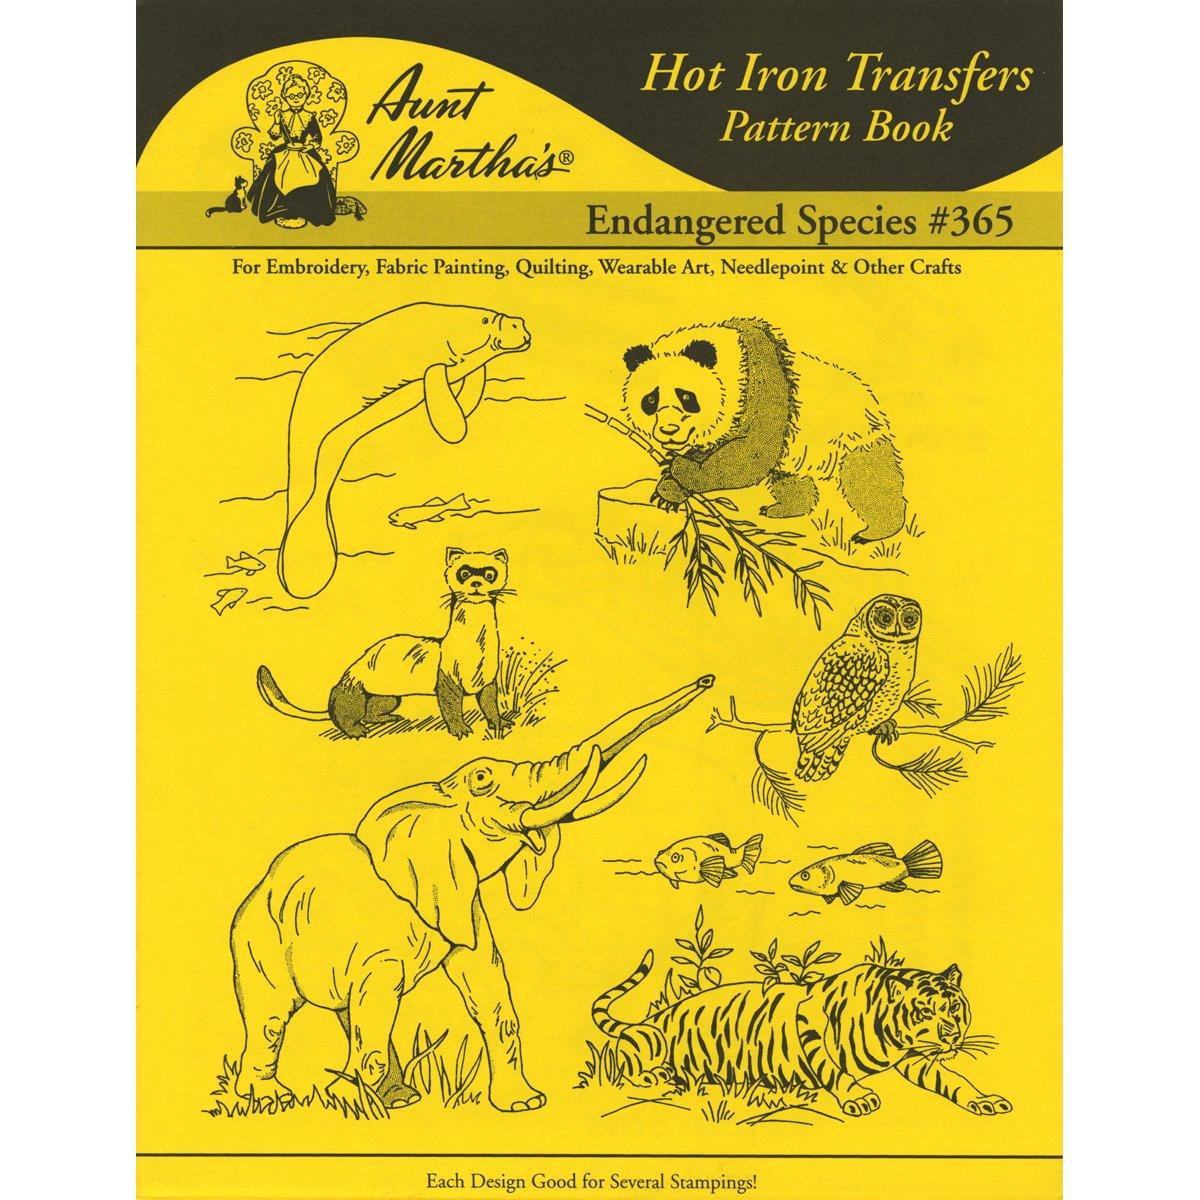 Aunt Marthas Iron on Transfer Books Endangered Species